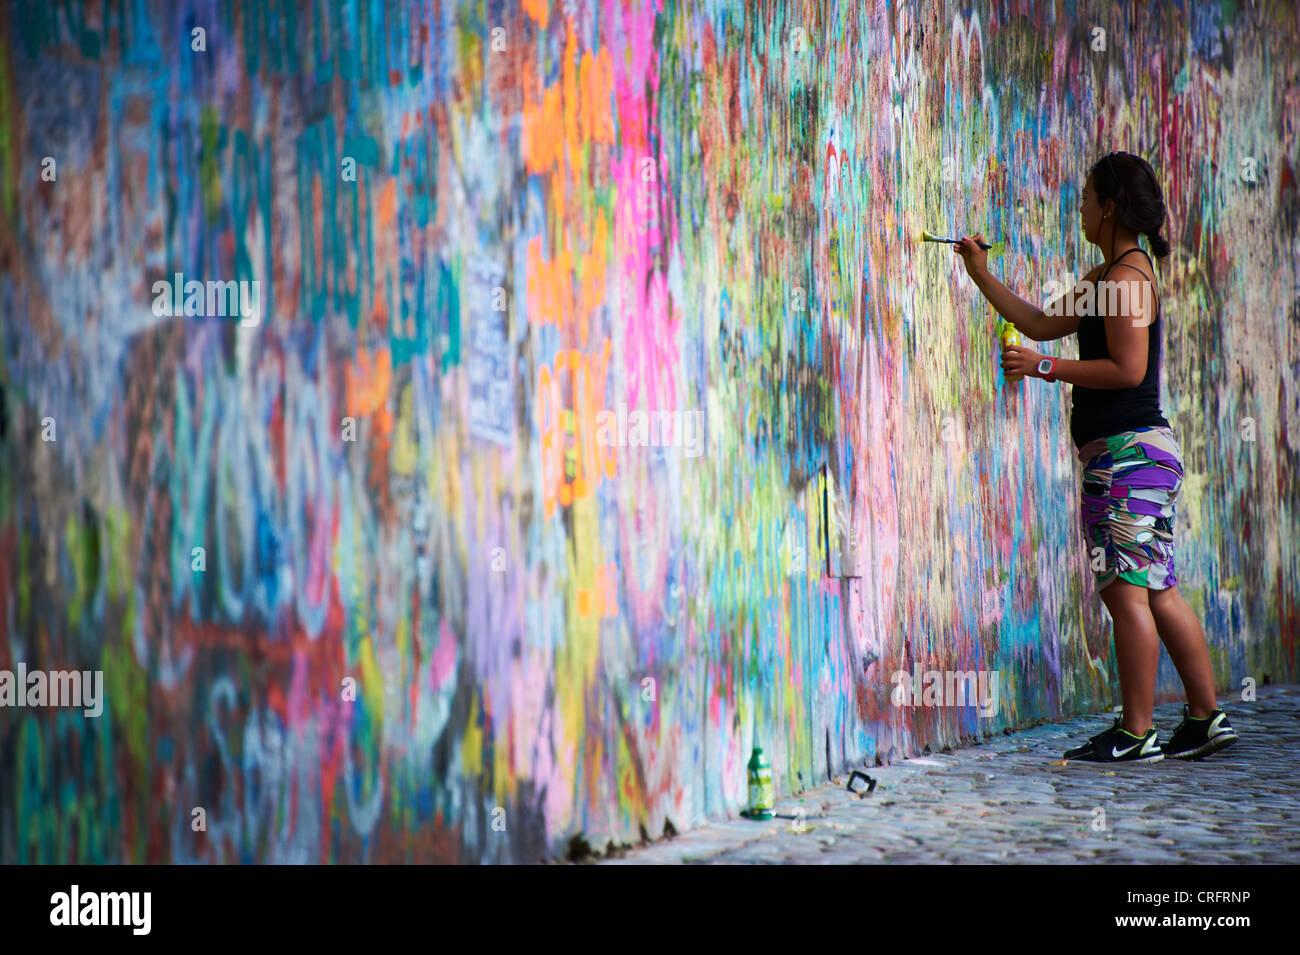 The John Lennon graffiti Wall in Prague, Czech Republic, tourist woman painting and writing testament - Stock Image